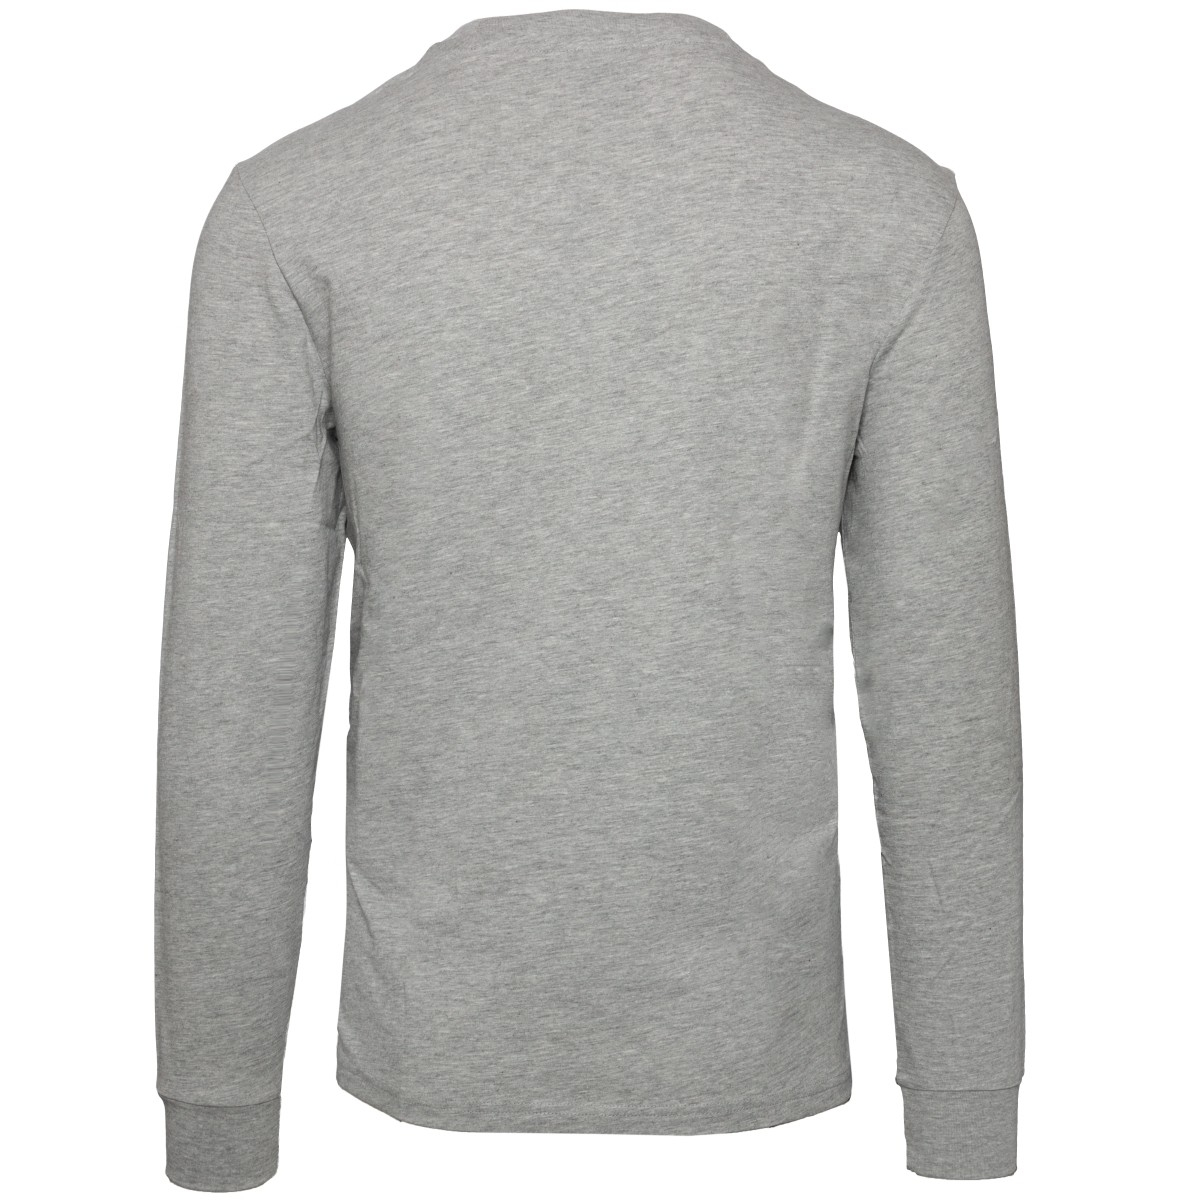 Champion Herren Long Sleeve T-Shirt 214157 grau